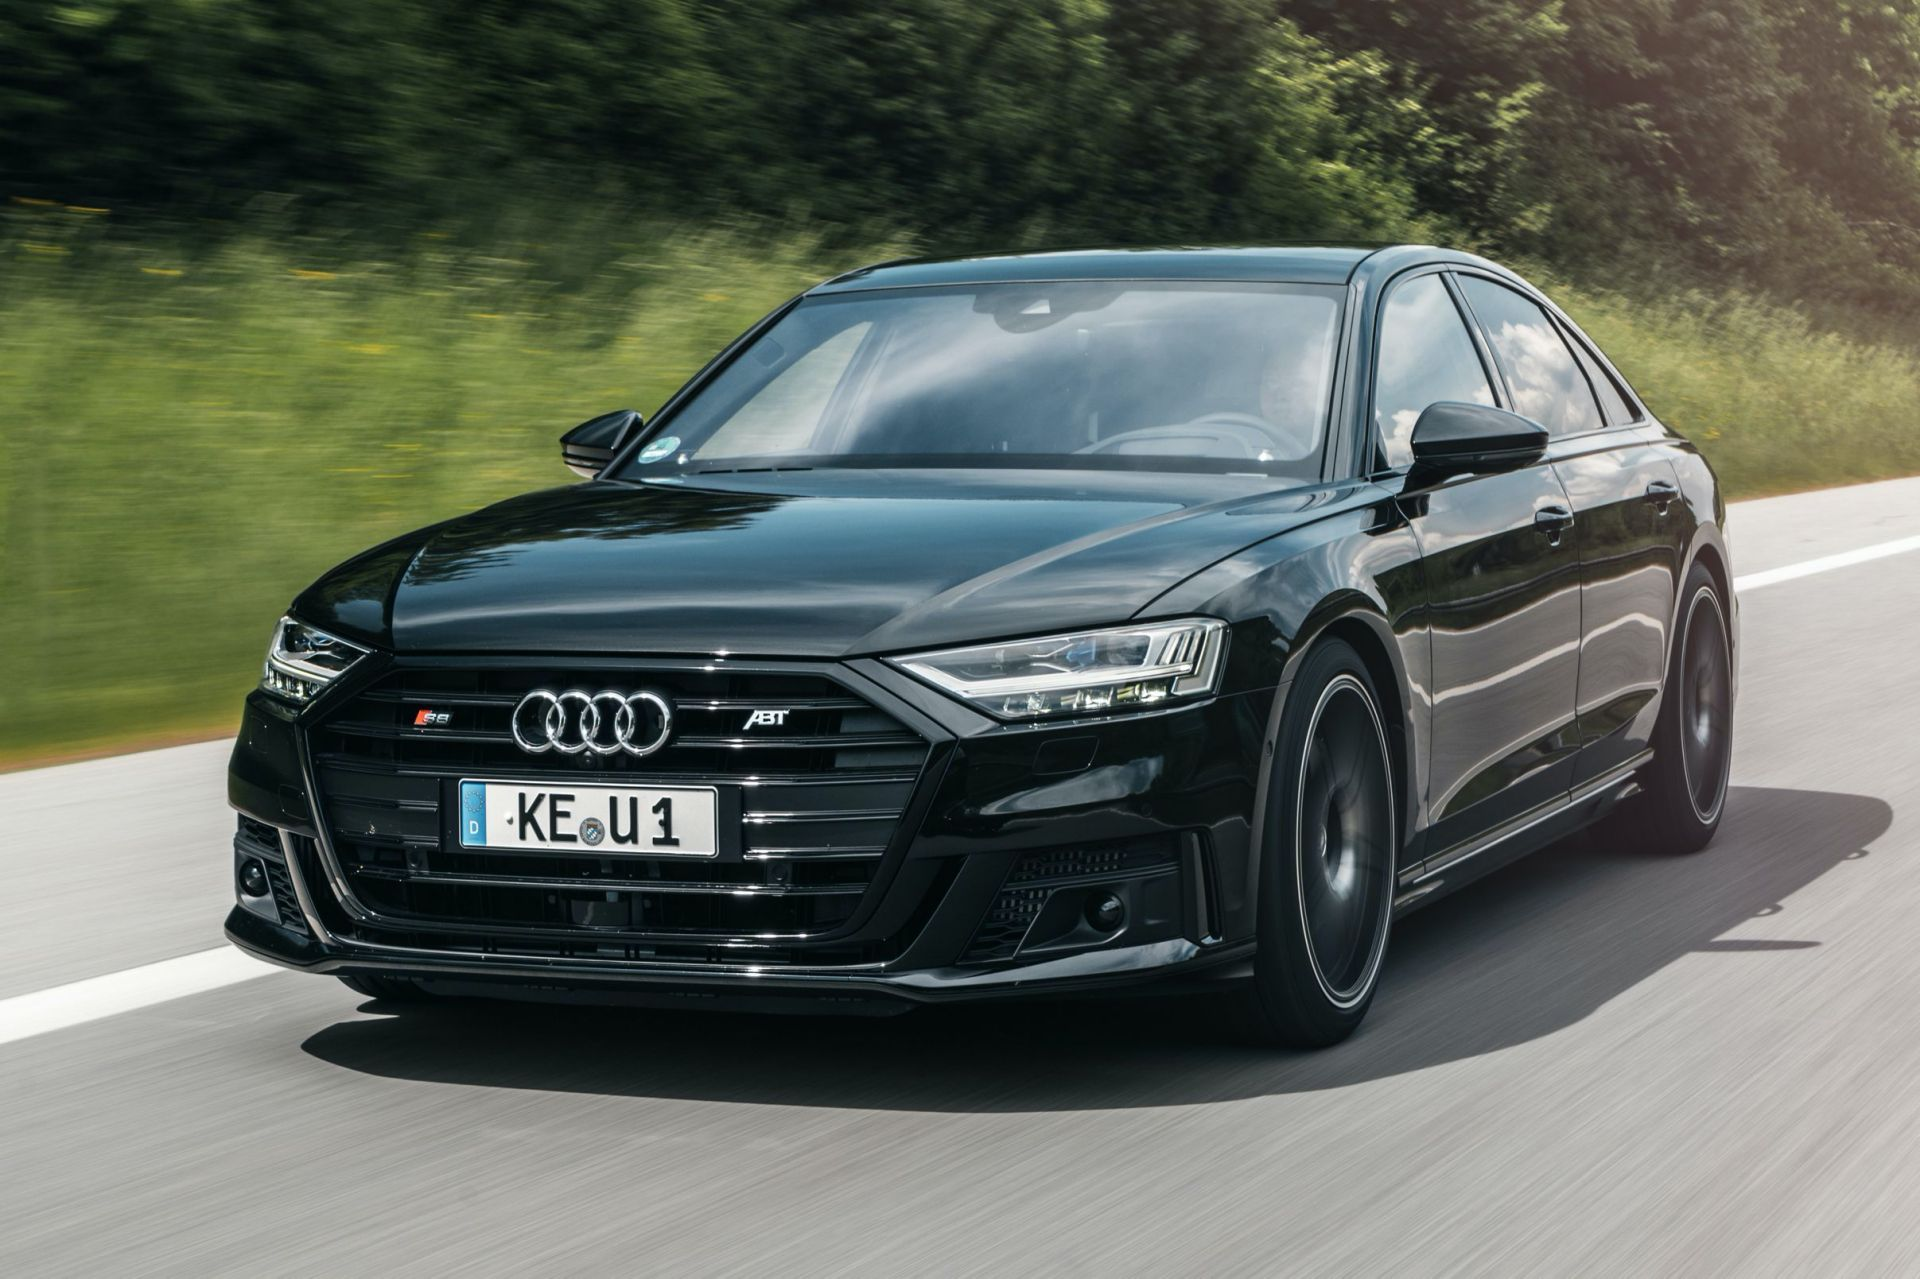 Audi-S8-by-ABT-Sportsline-1-6